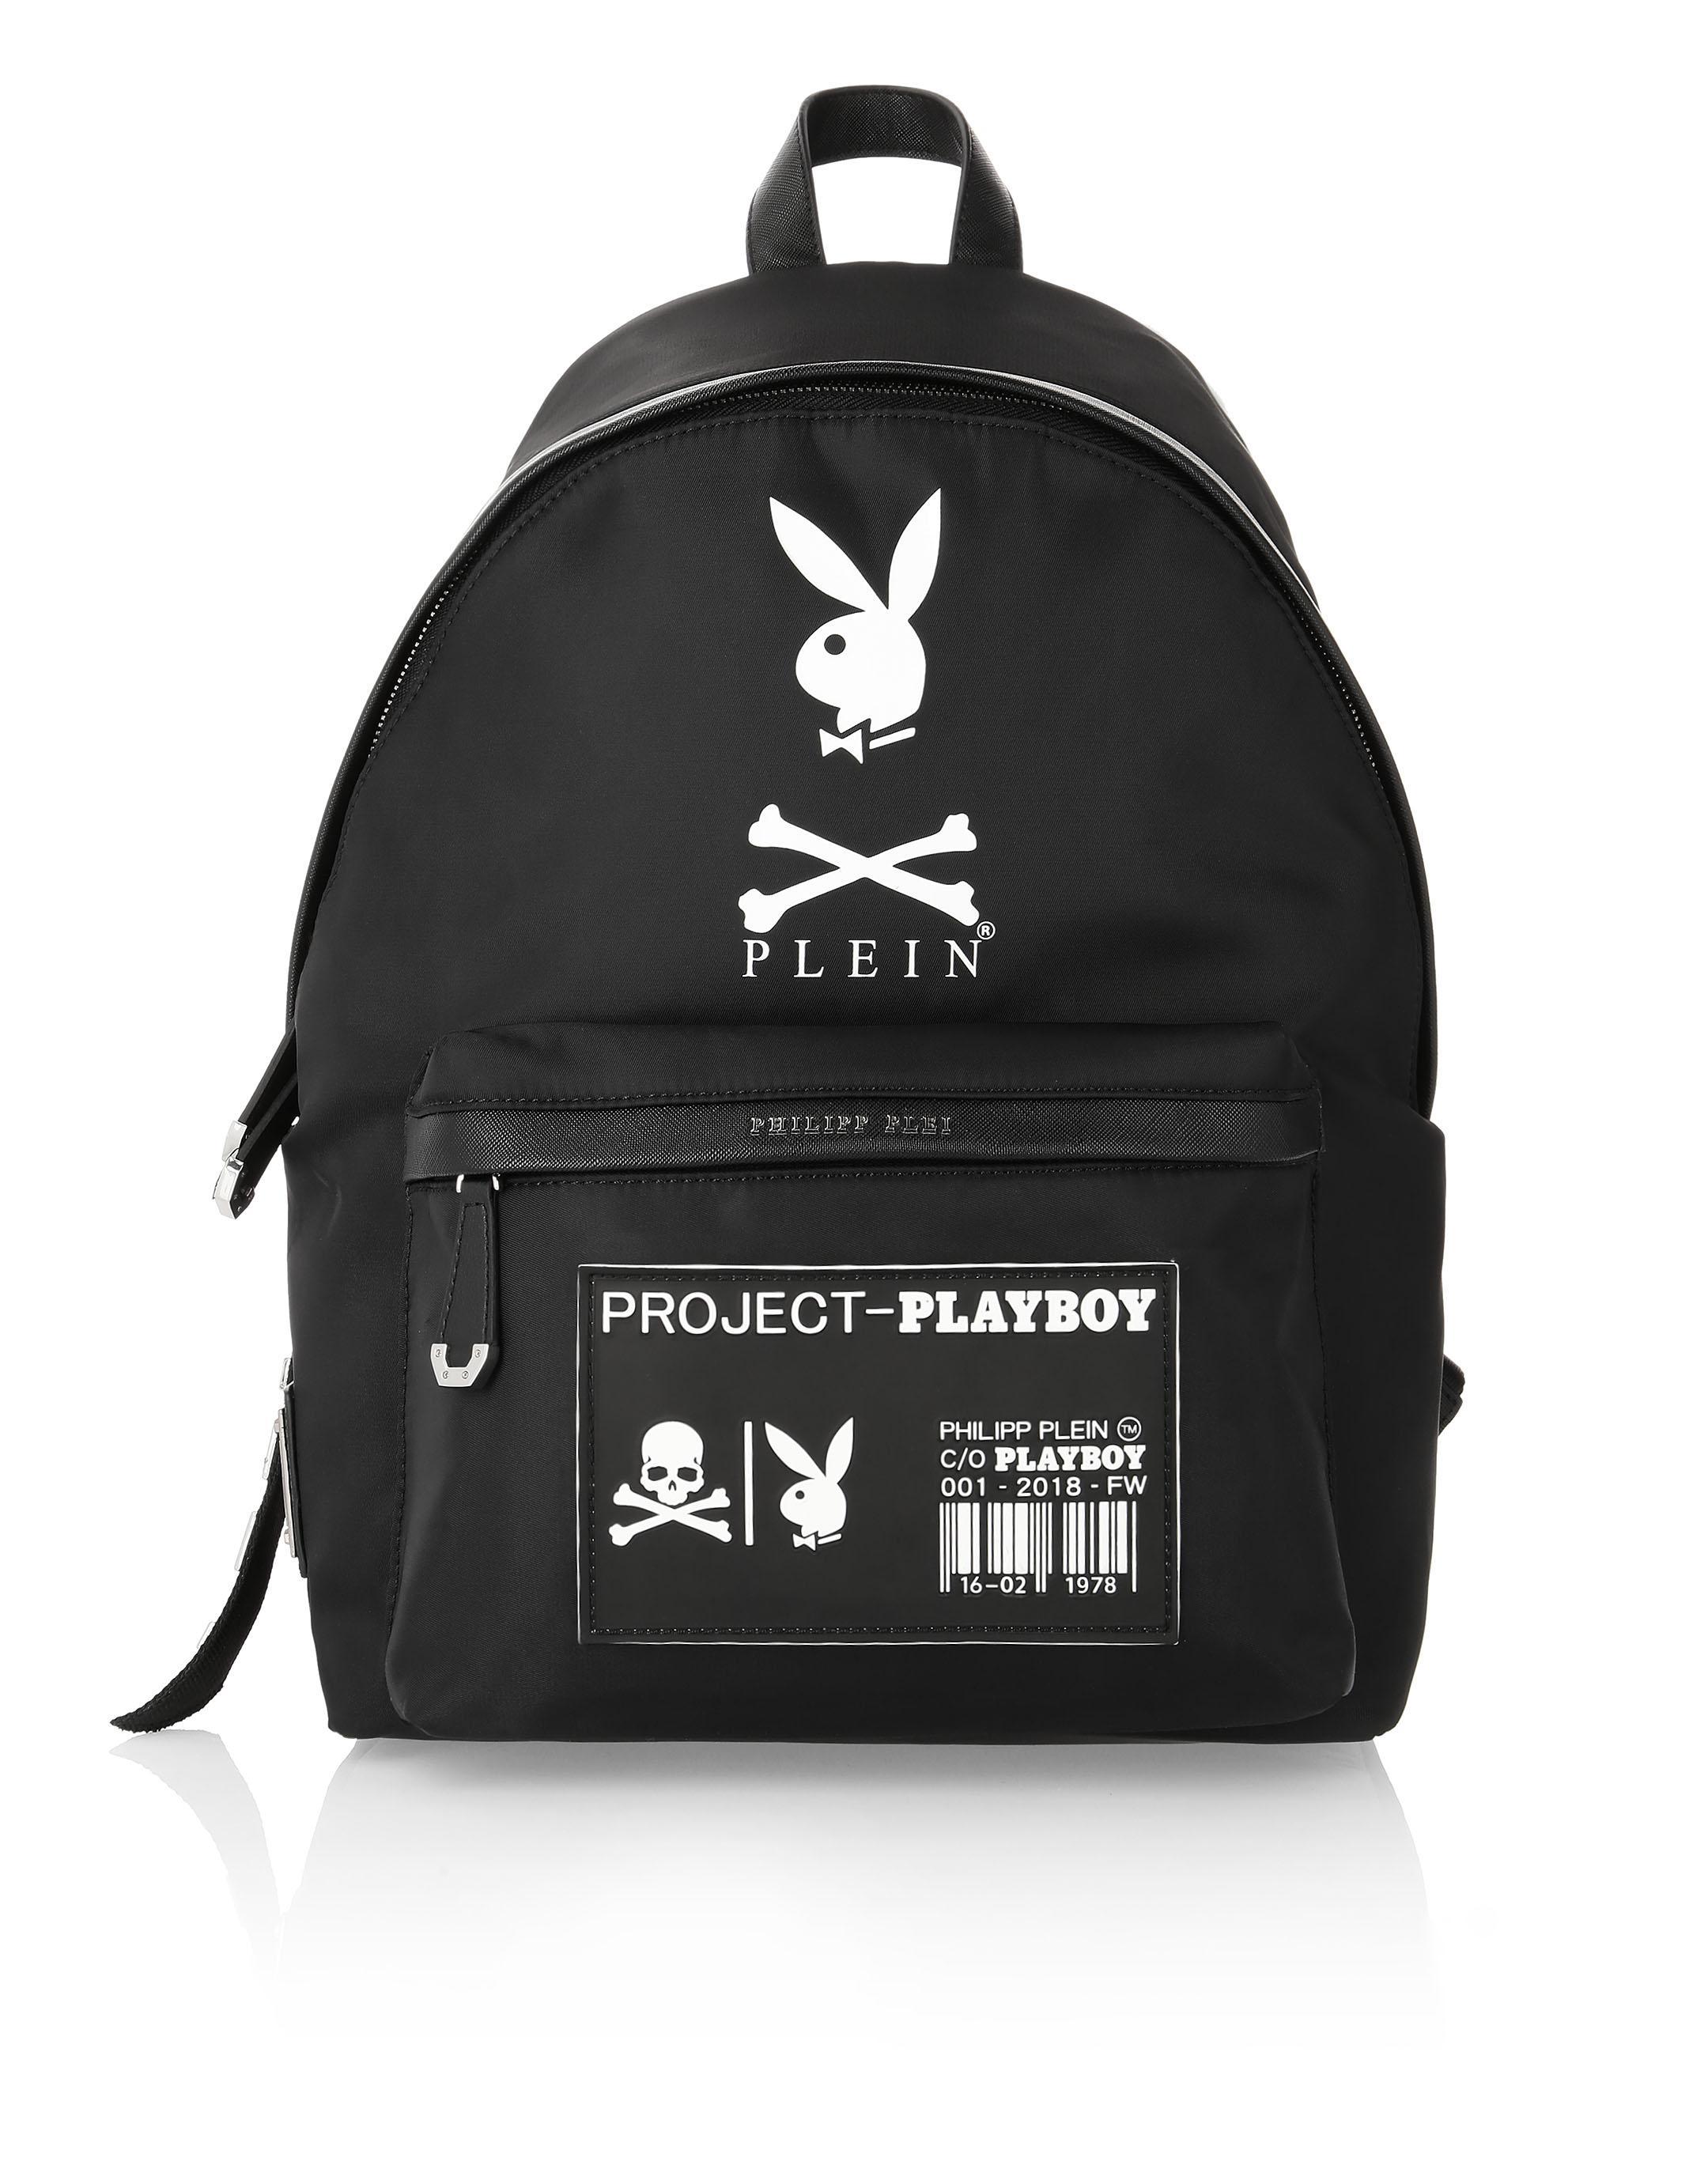 26897711a80 Philipp Plein Backpack Playboy In Black   White